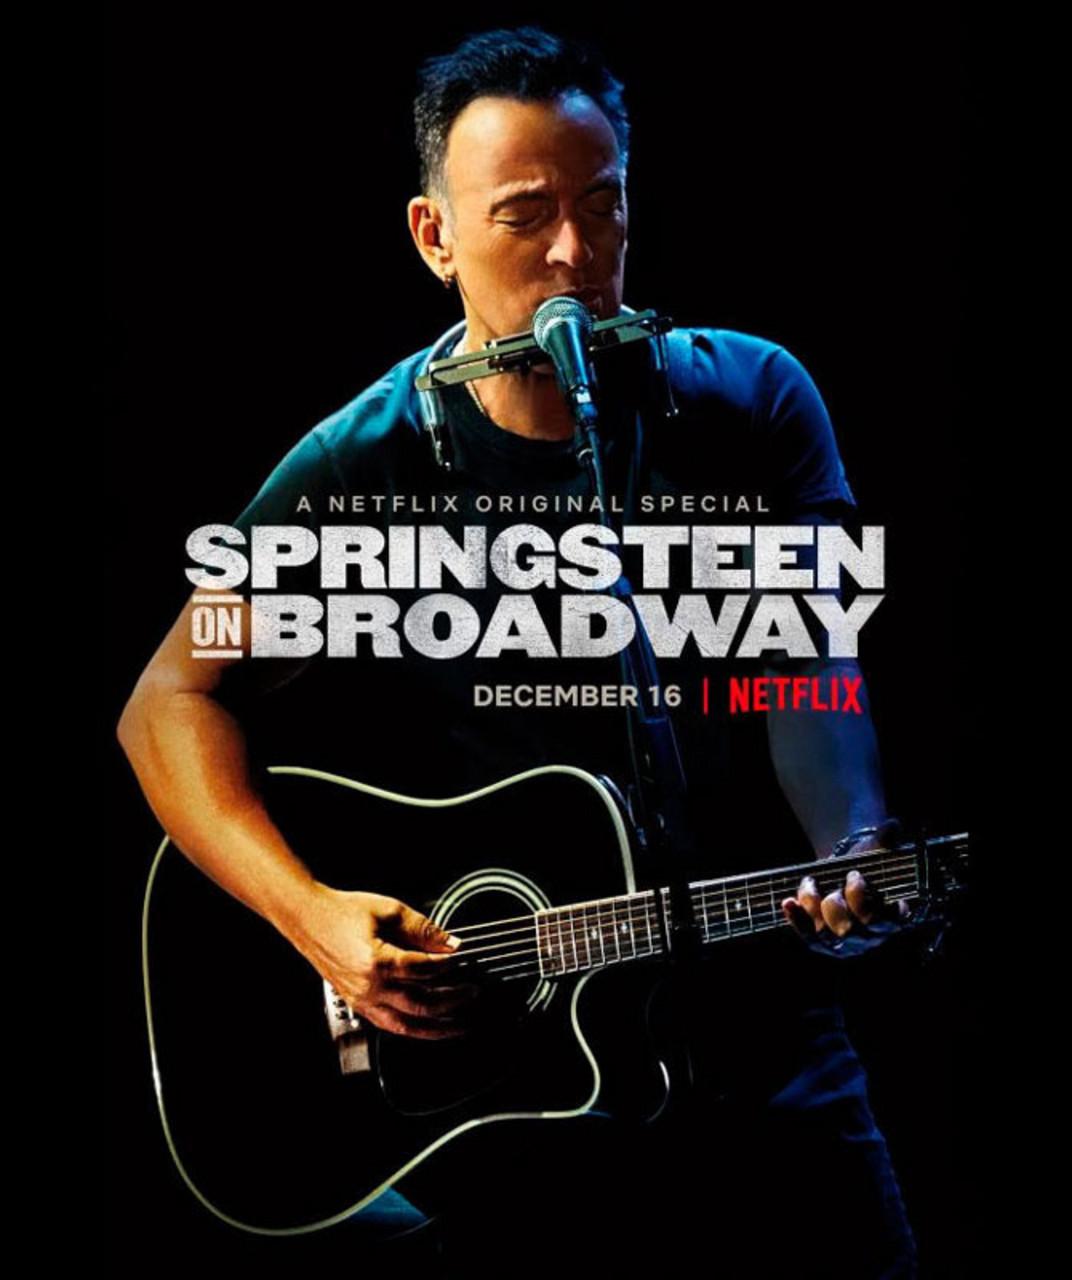 Springsteen se desnuda en Broadway